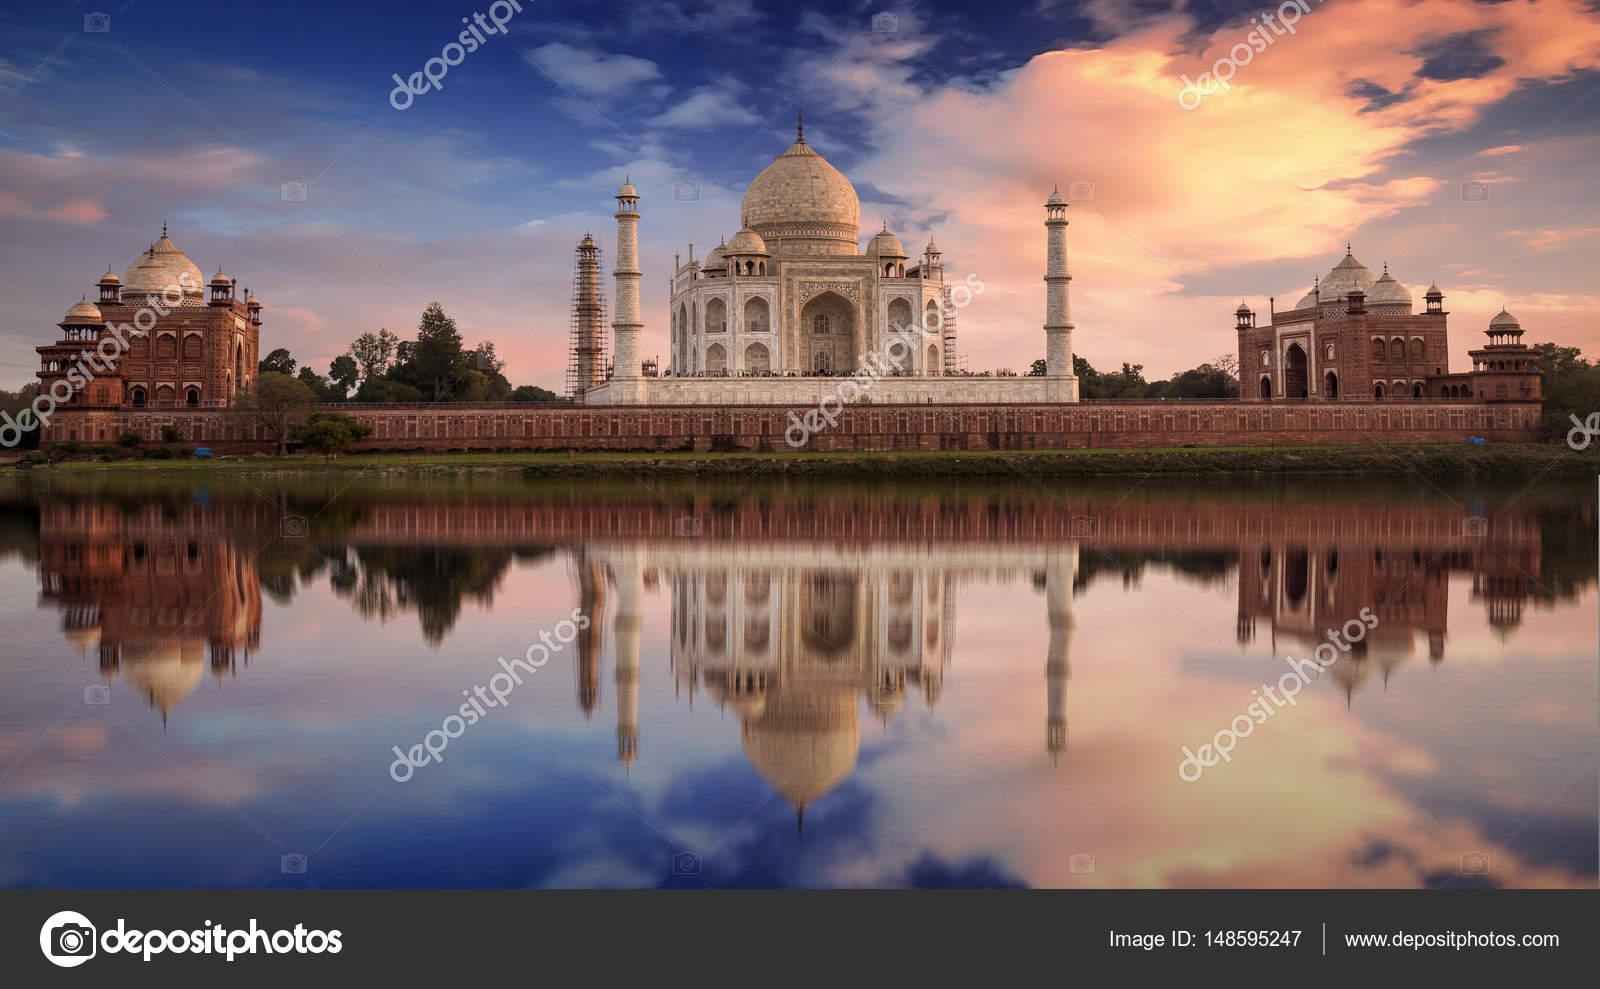 Taj Mahal Pictures Scenic Travel Photos: Taj Mahal Slunce Vyhlídku Od Michaela Bagh Na Břehu řeky